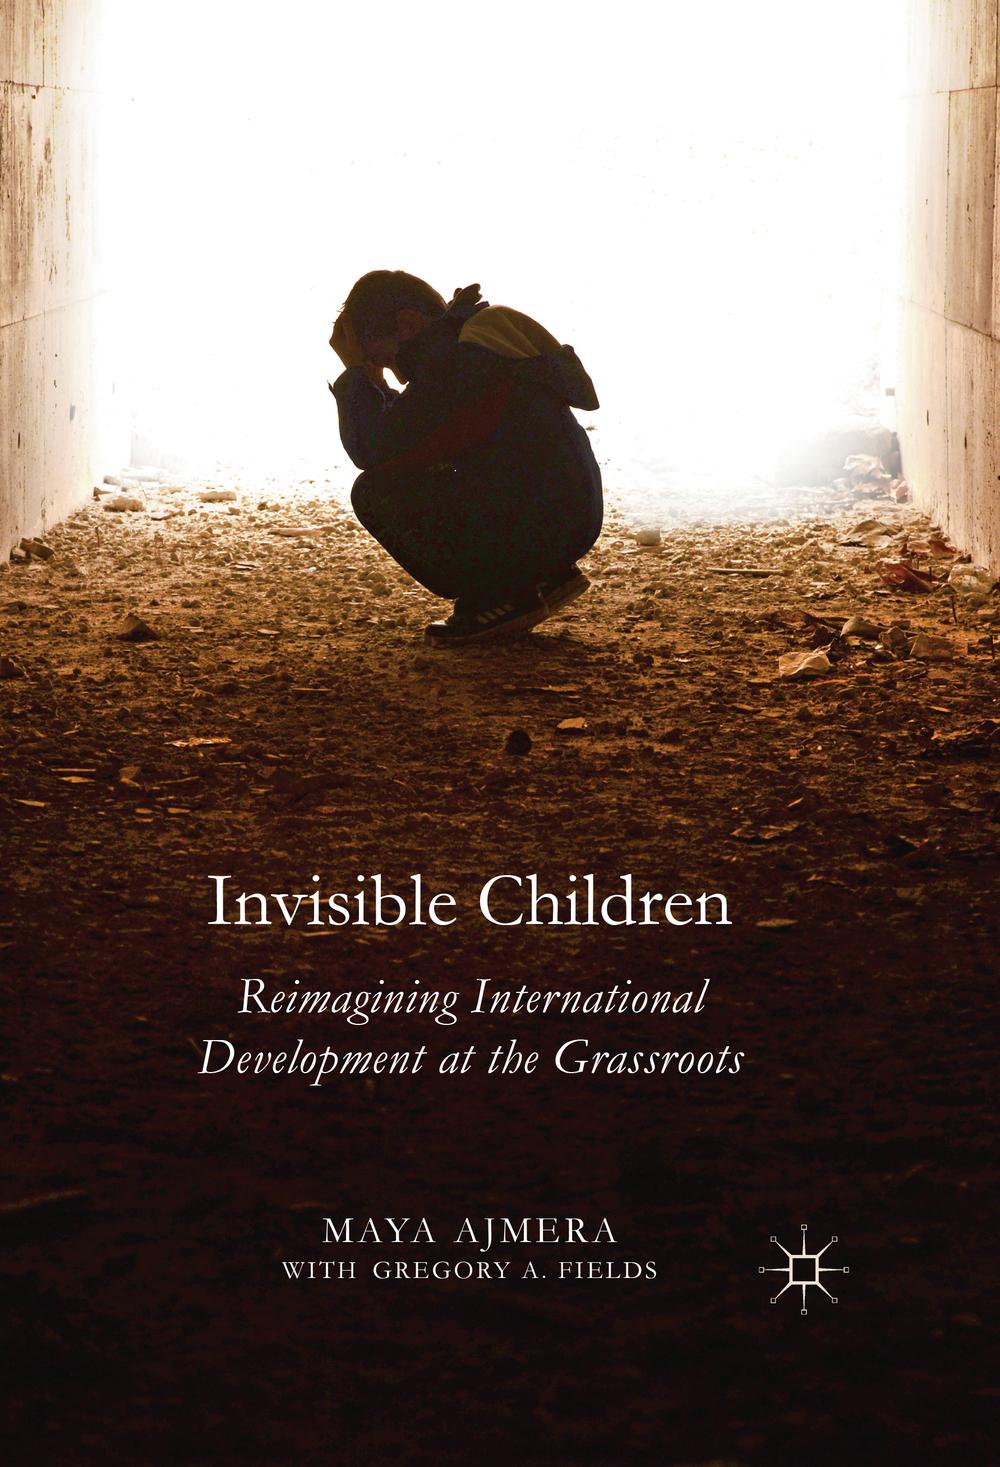 Invisible Children: Reimagining International Development at the Grassroots